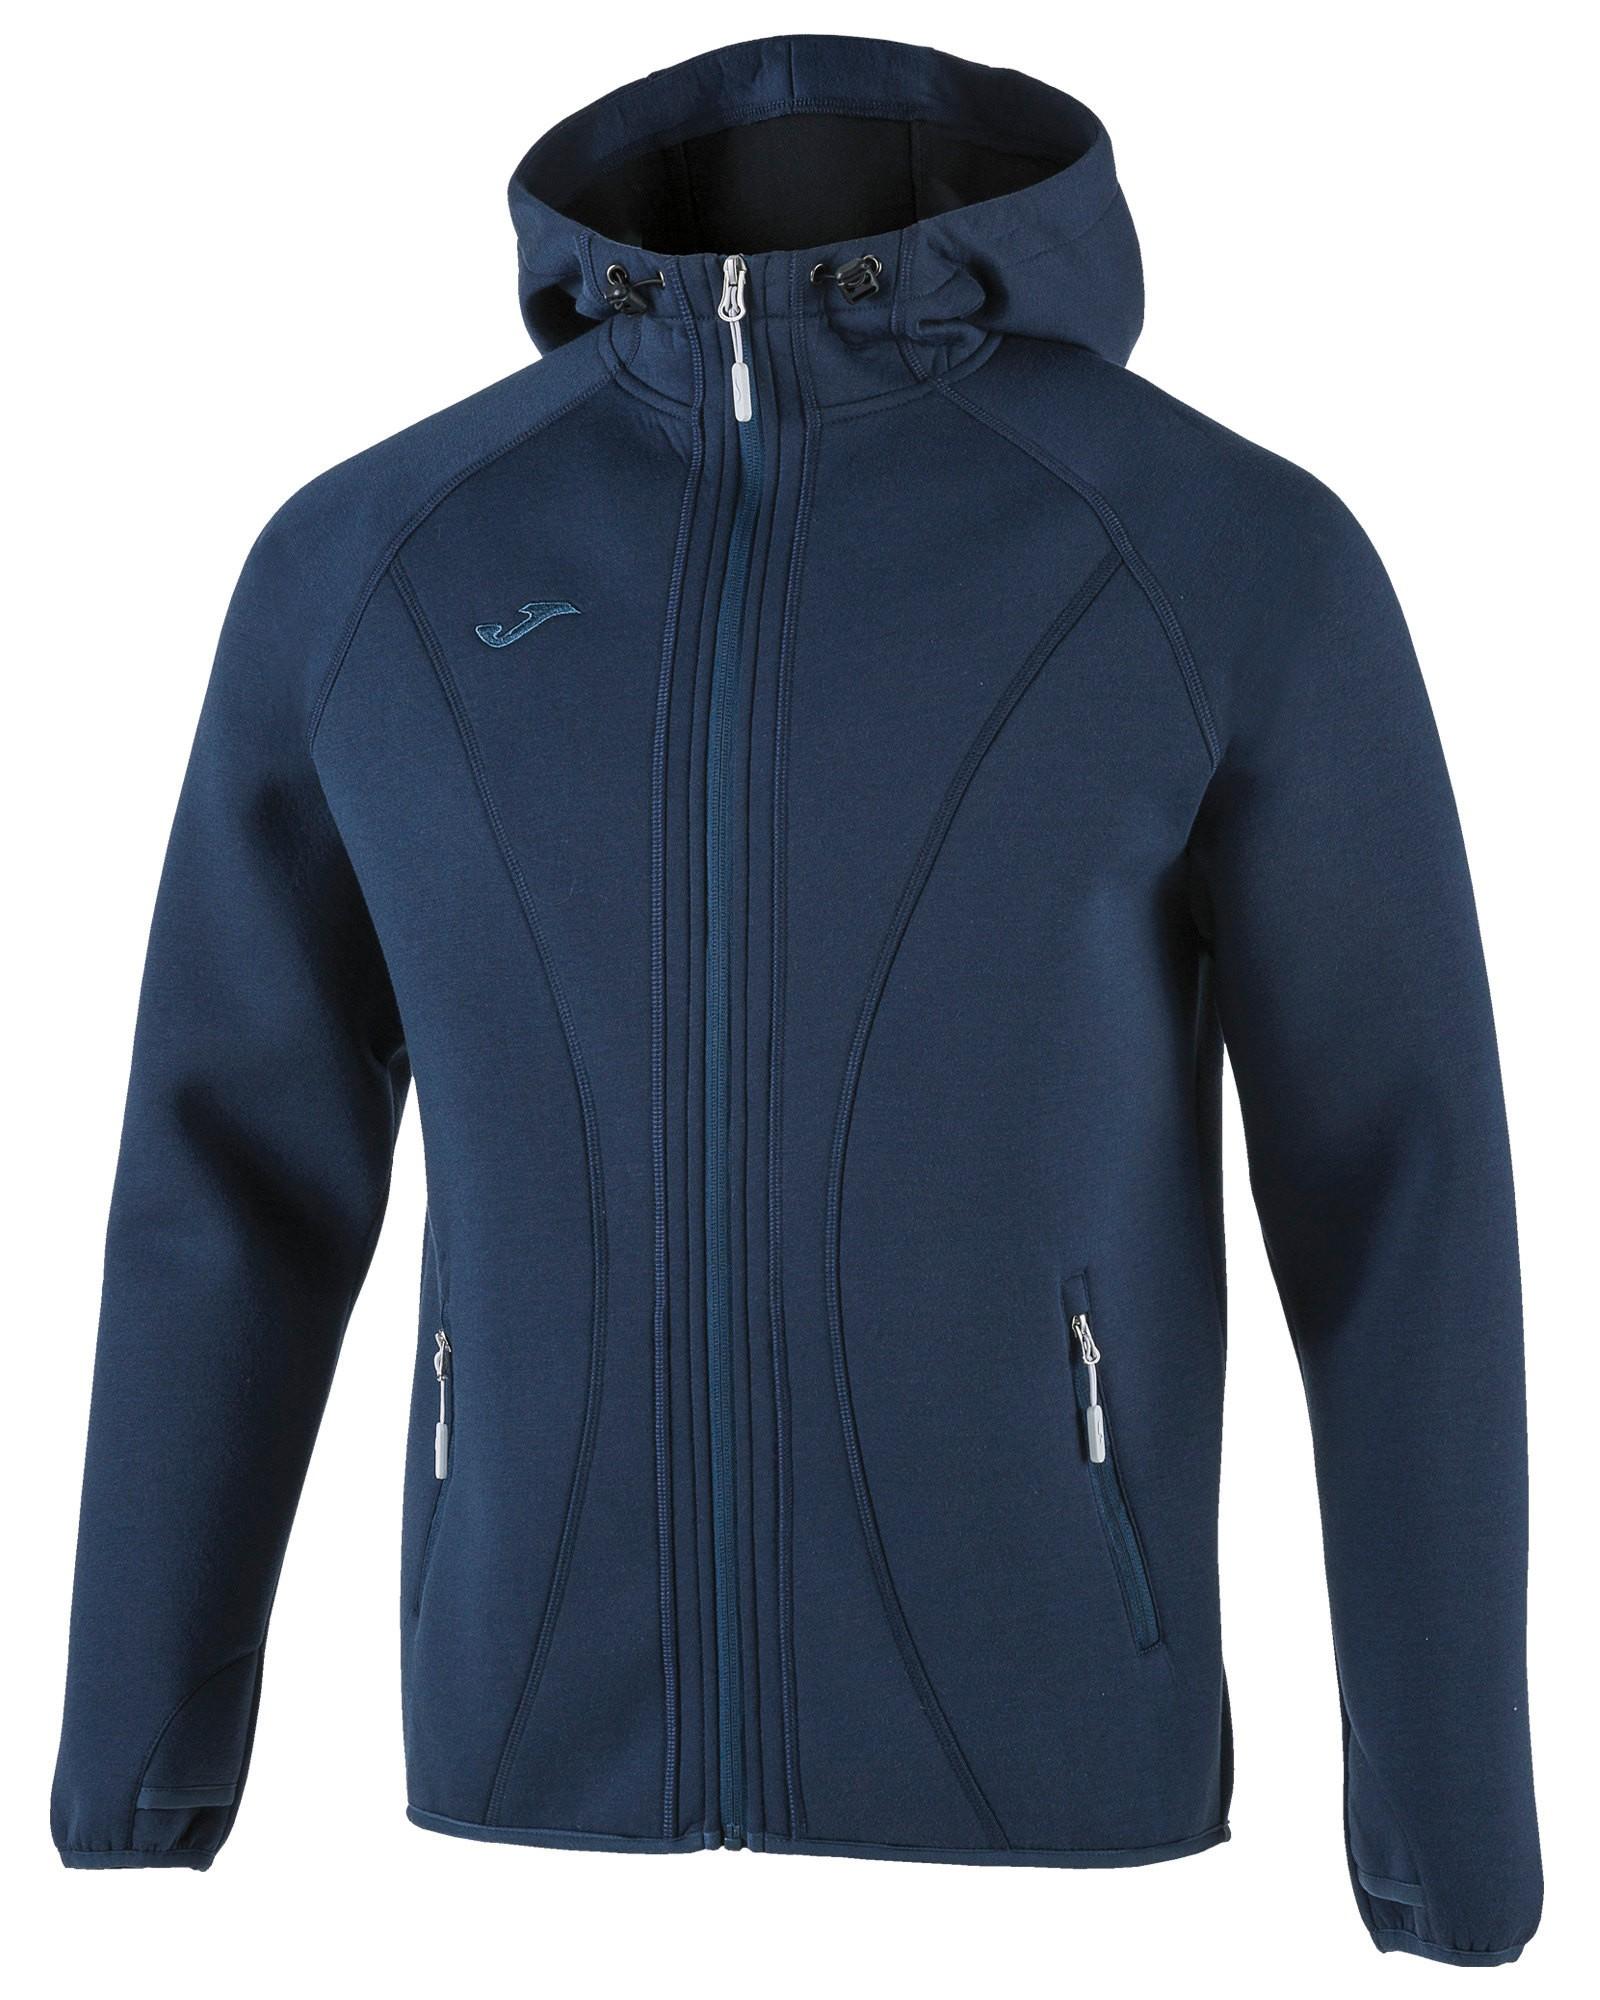 Joma Giacca Sportiva sport Jacket SoftShell Basilea con TASCHE a ZIP -Blu - 3310